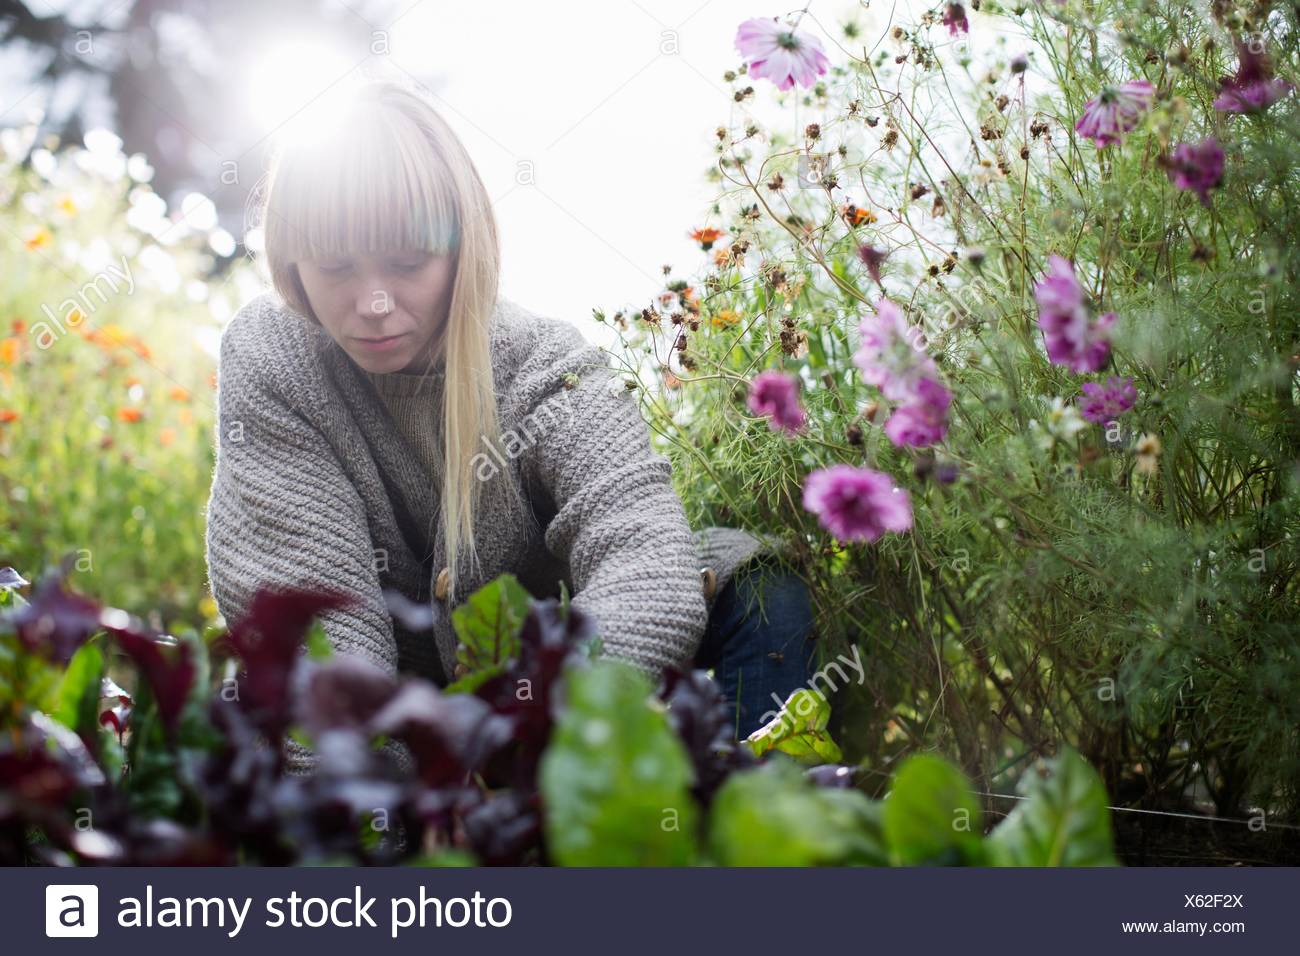 Mid adult woman tending lettuce in organic garden - Stock Image